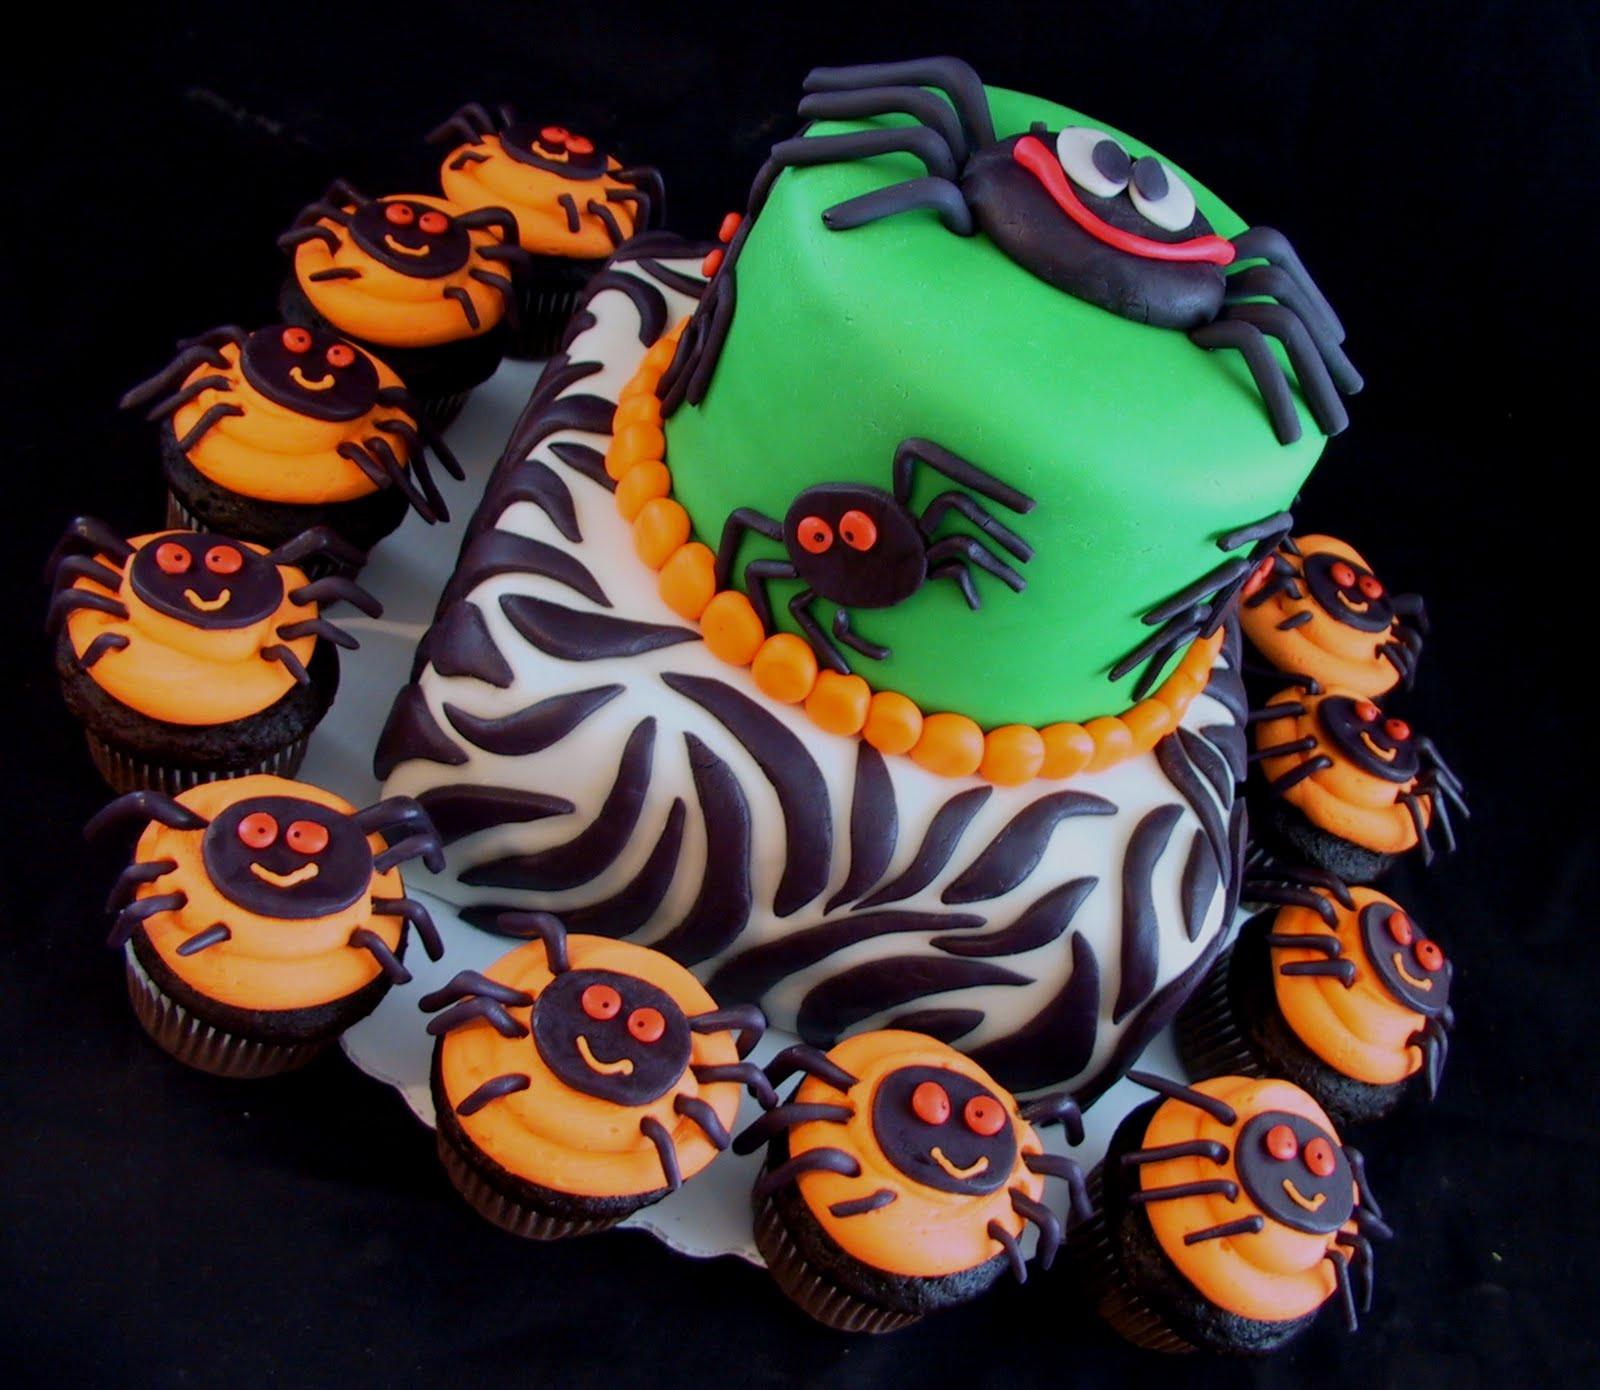 Halloween Cakes And Cupcakes  Birthday Cake Center Halloween Birthday Cakes 2011